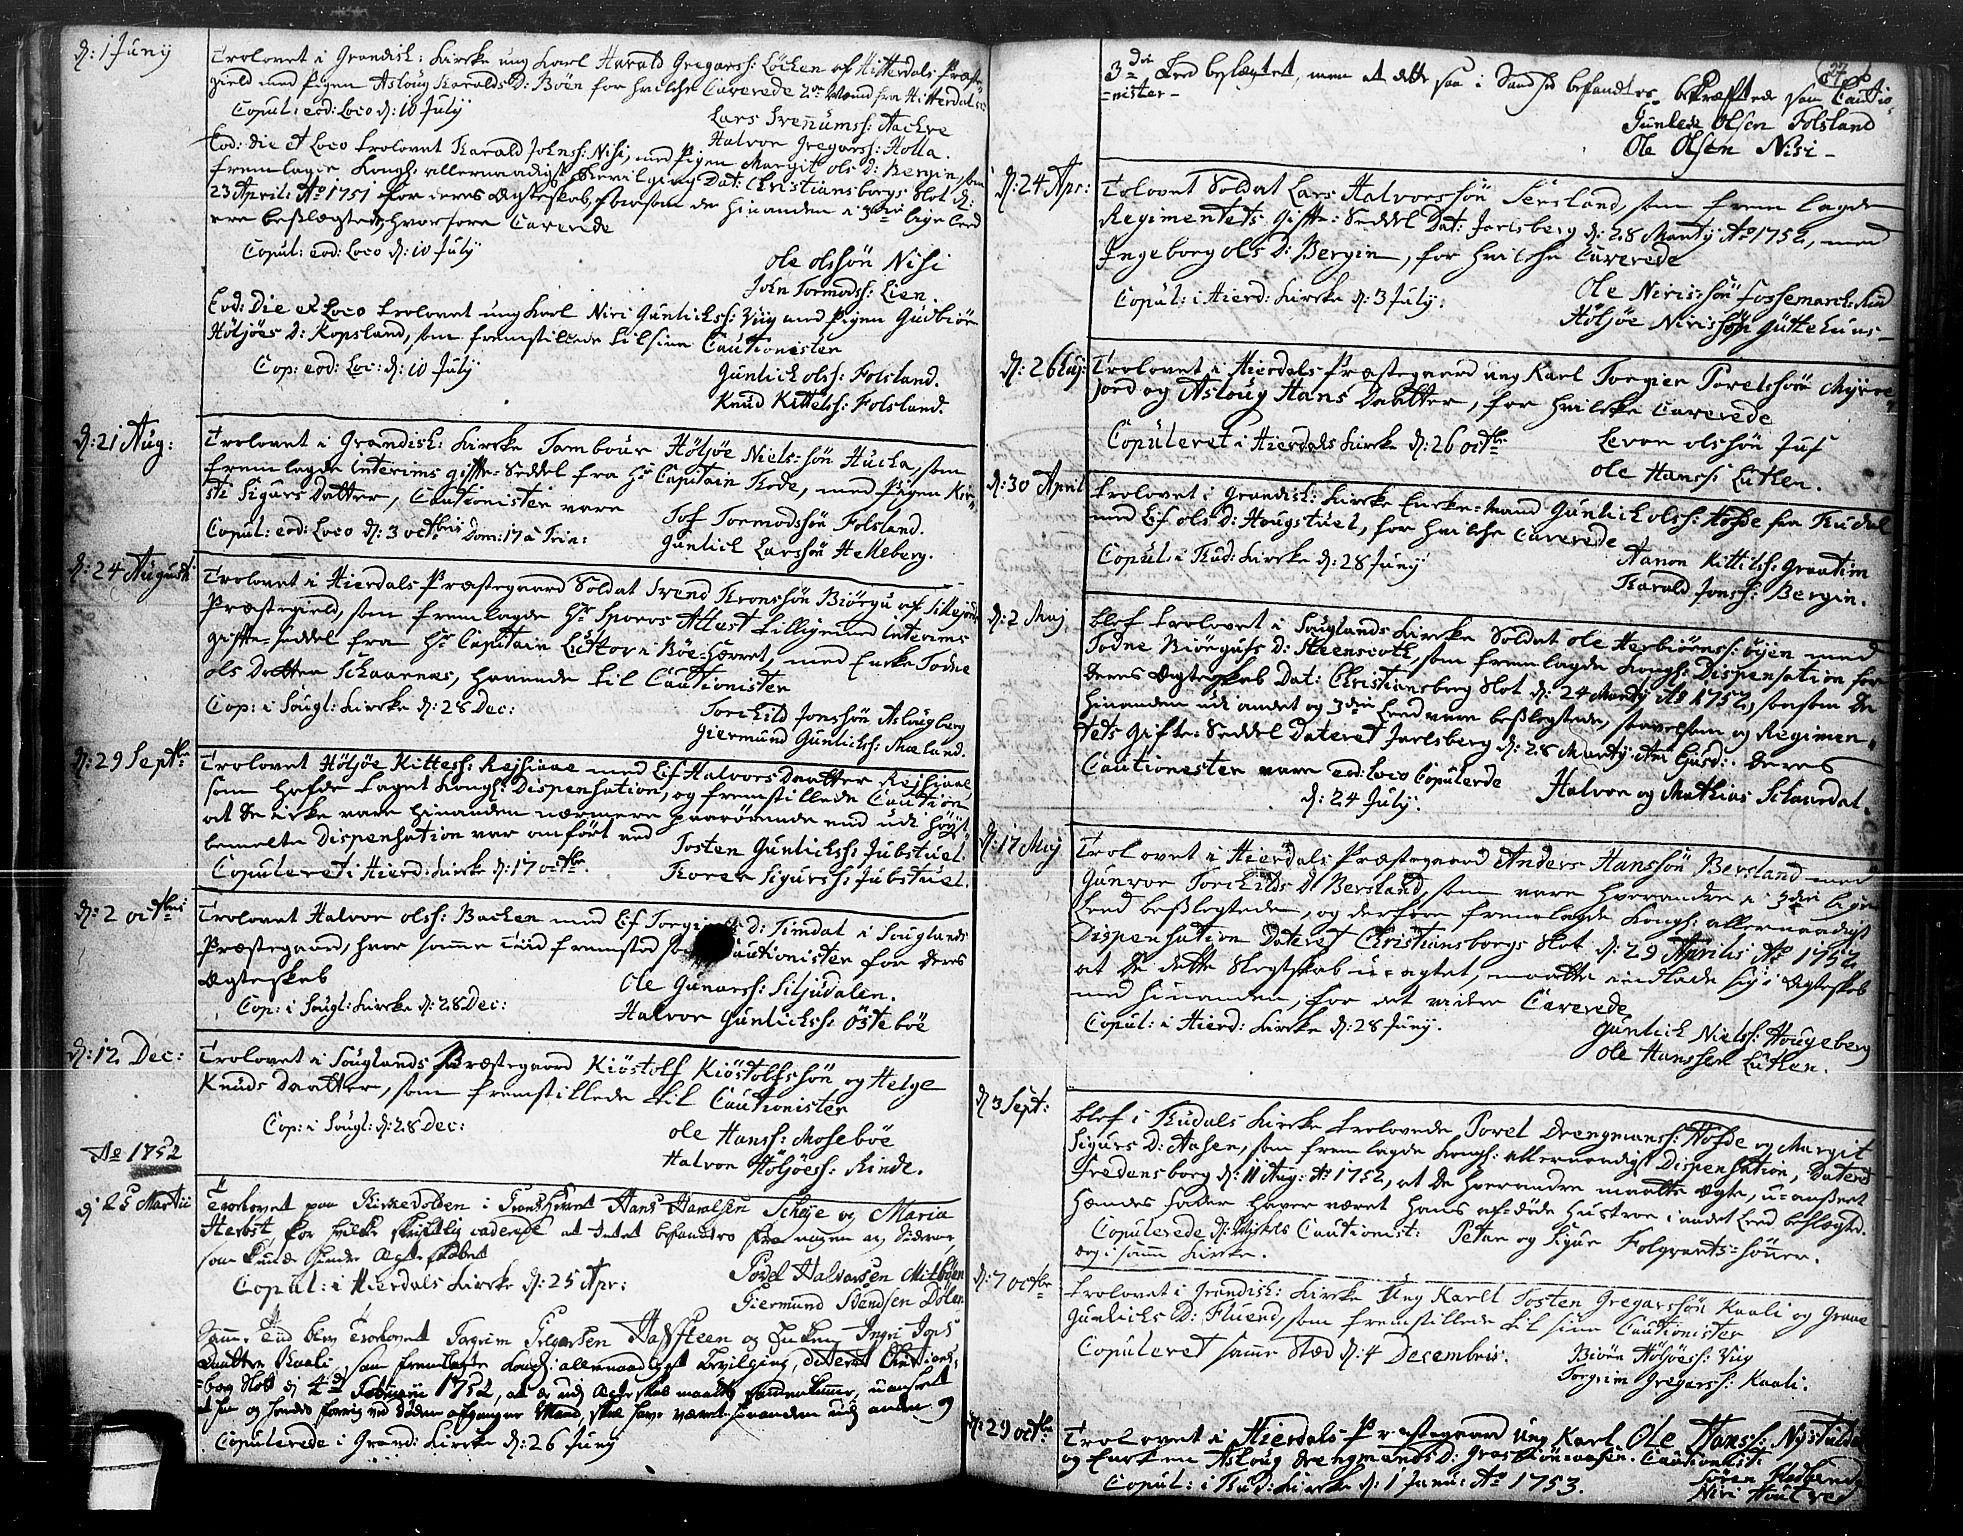 SAKO, Hjartdal kirkebøker, F/Fa/L0004: Ministerialbok nr. I 4, 1727-1795, s. 27